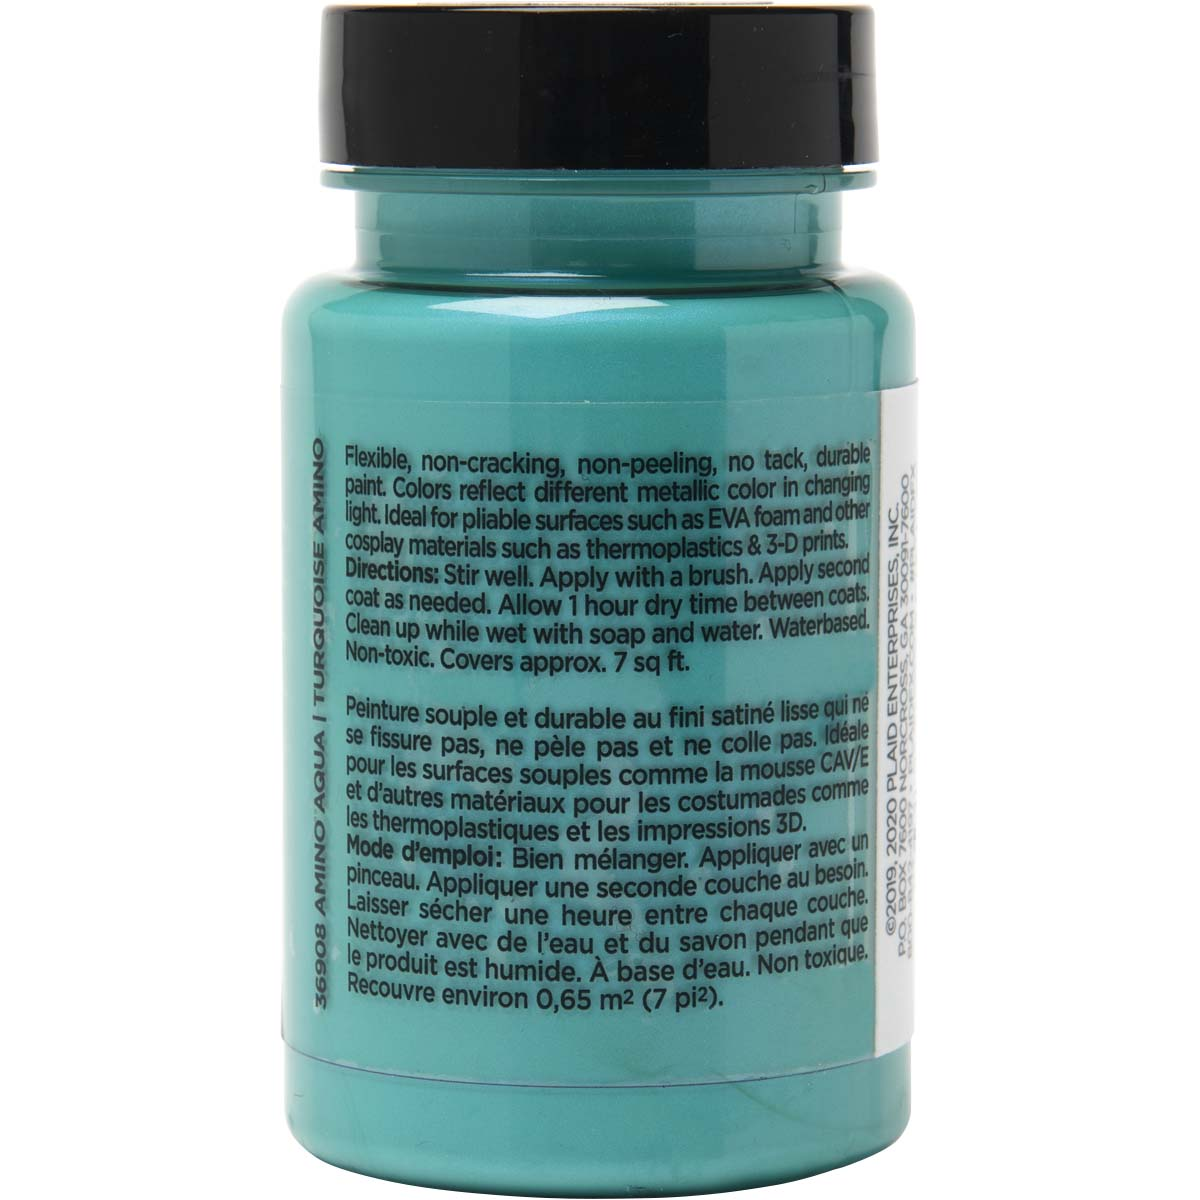 PlaidFX Mutant Shift Flexible Acrylic Paint - Amino Aqua, 3 oz. - 36908